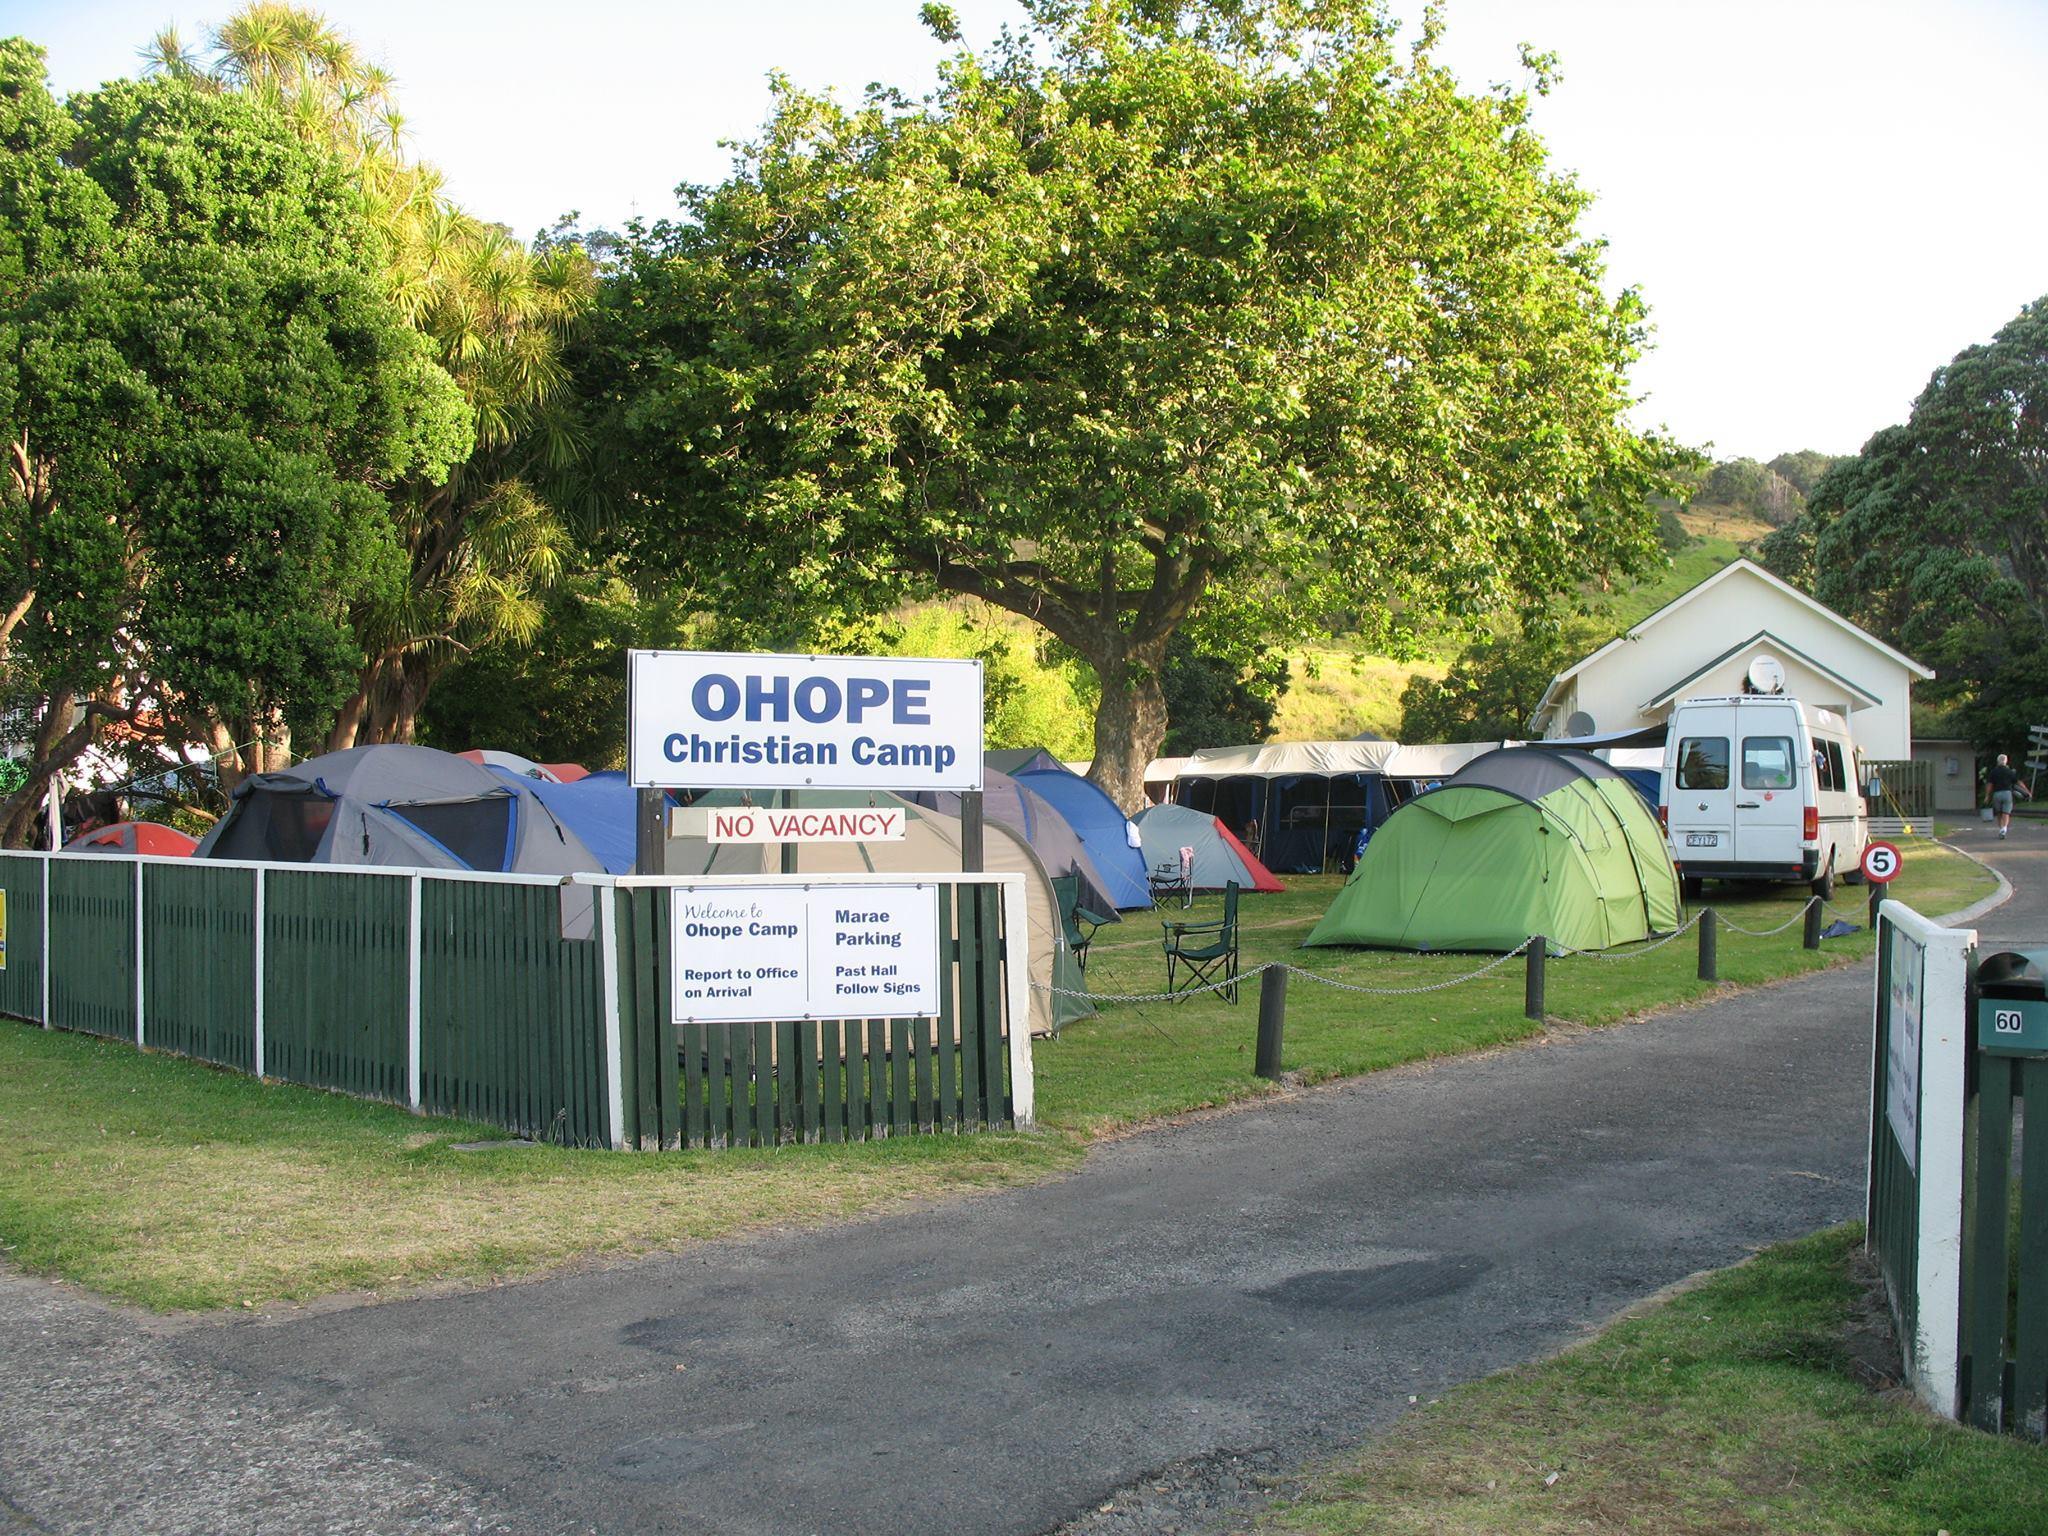 Ohope Christian Camp